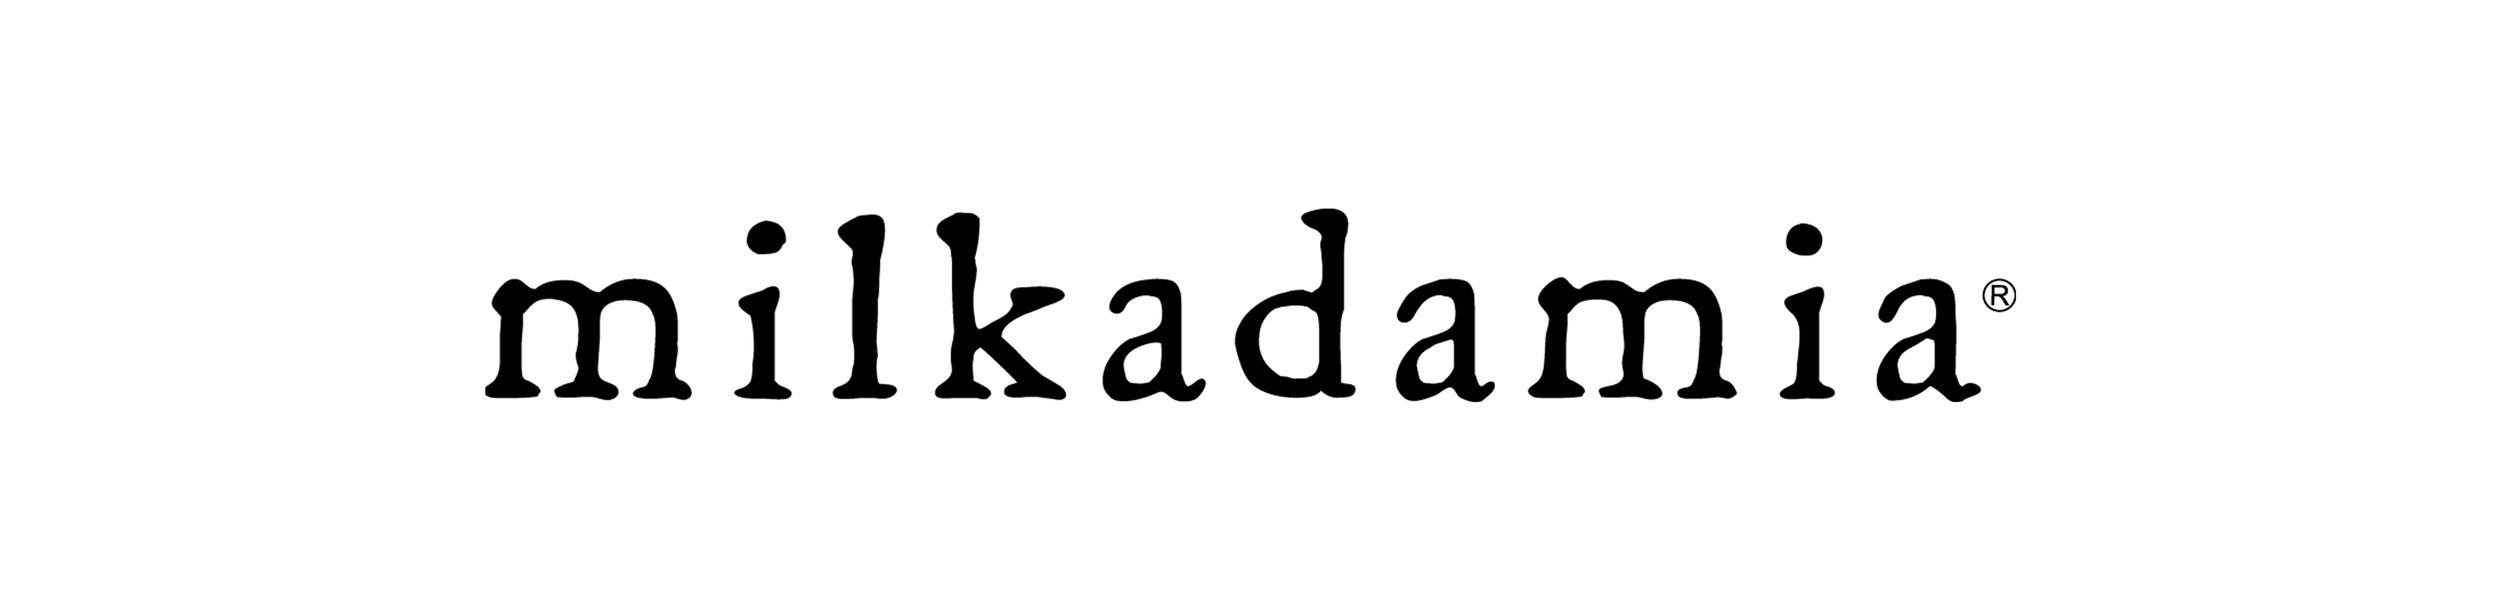 Milkadamia.png